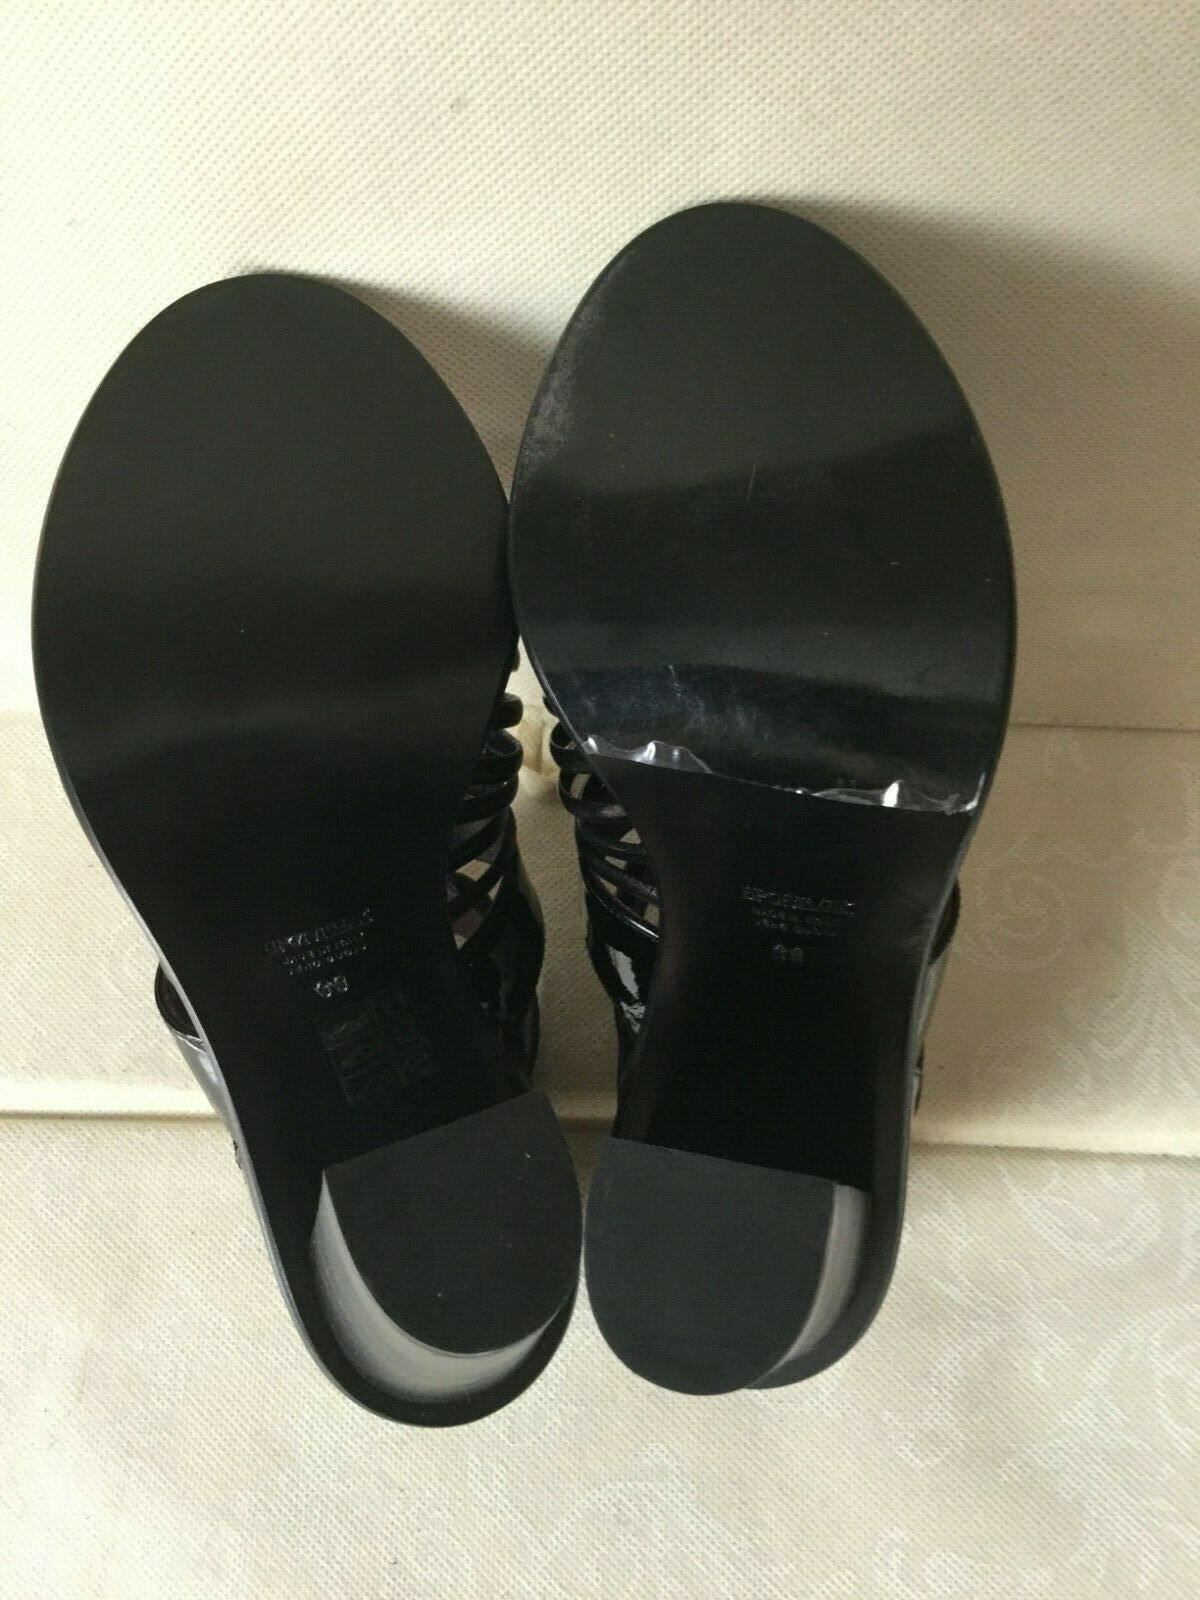 Fantastic sandals sandals sandals SPORTMAX Donna, nero, Dimensione 39, leather  Sandali Donna, pelle 981ef9